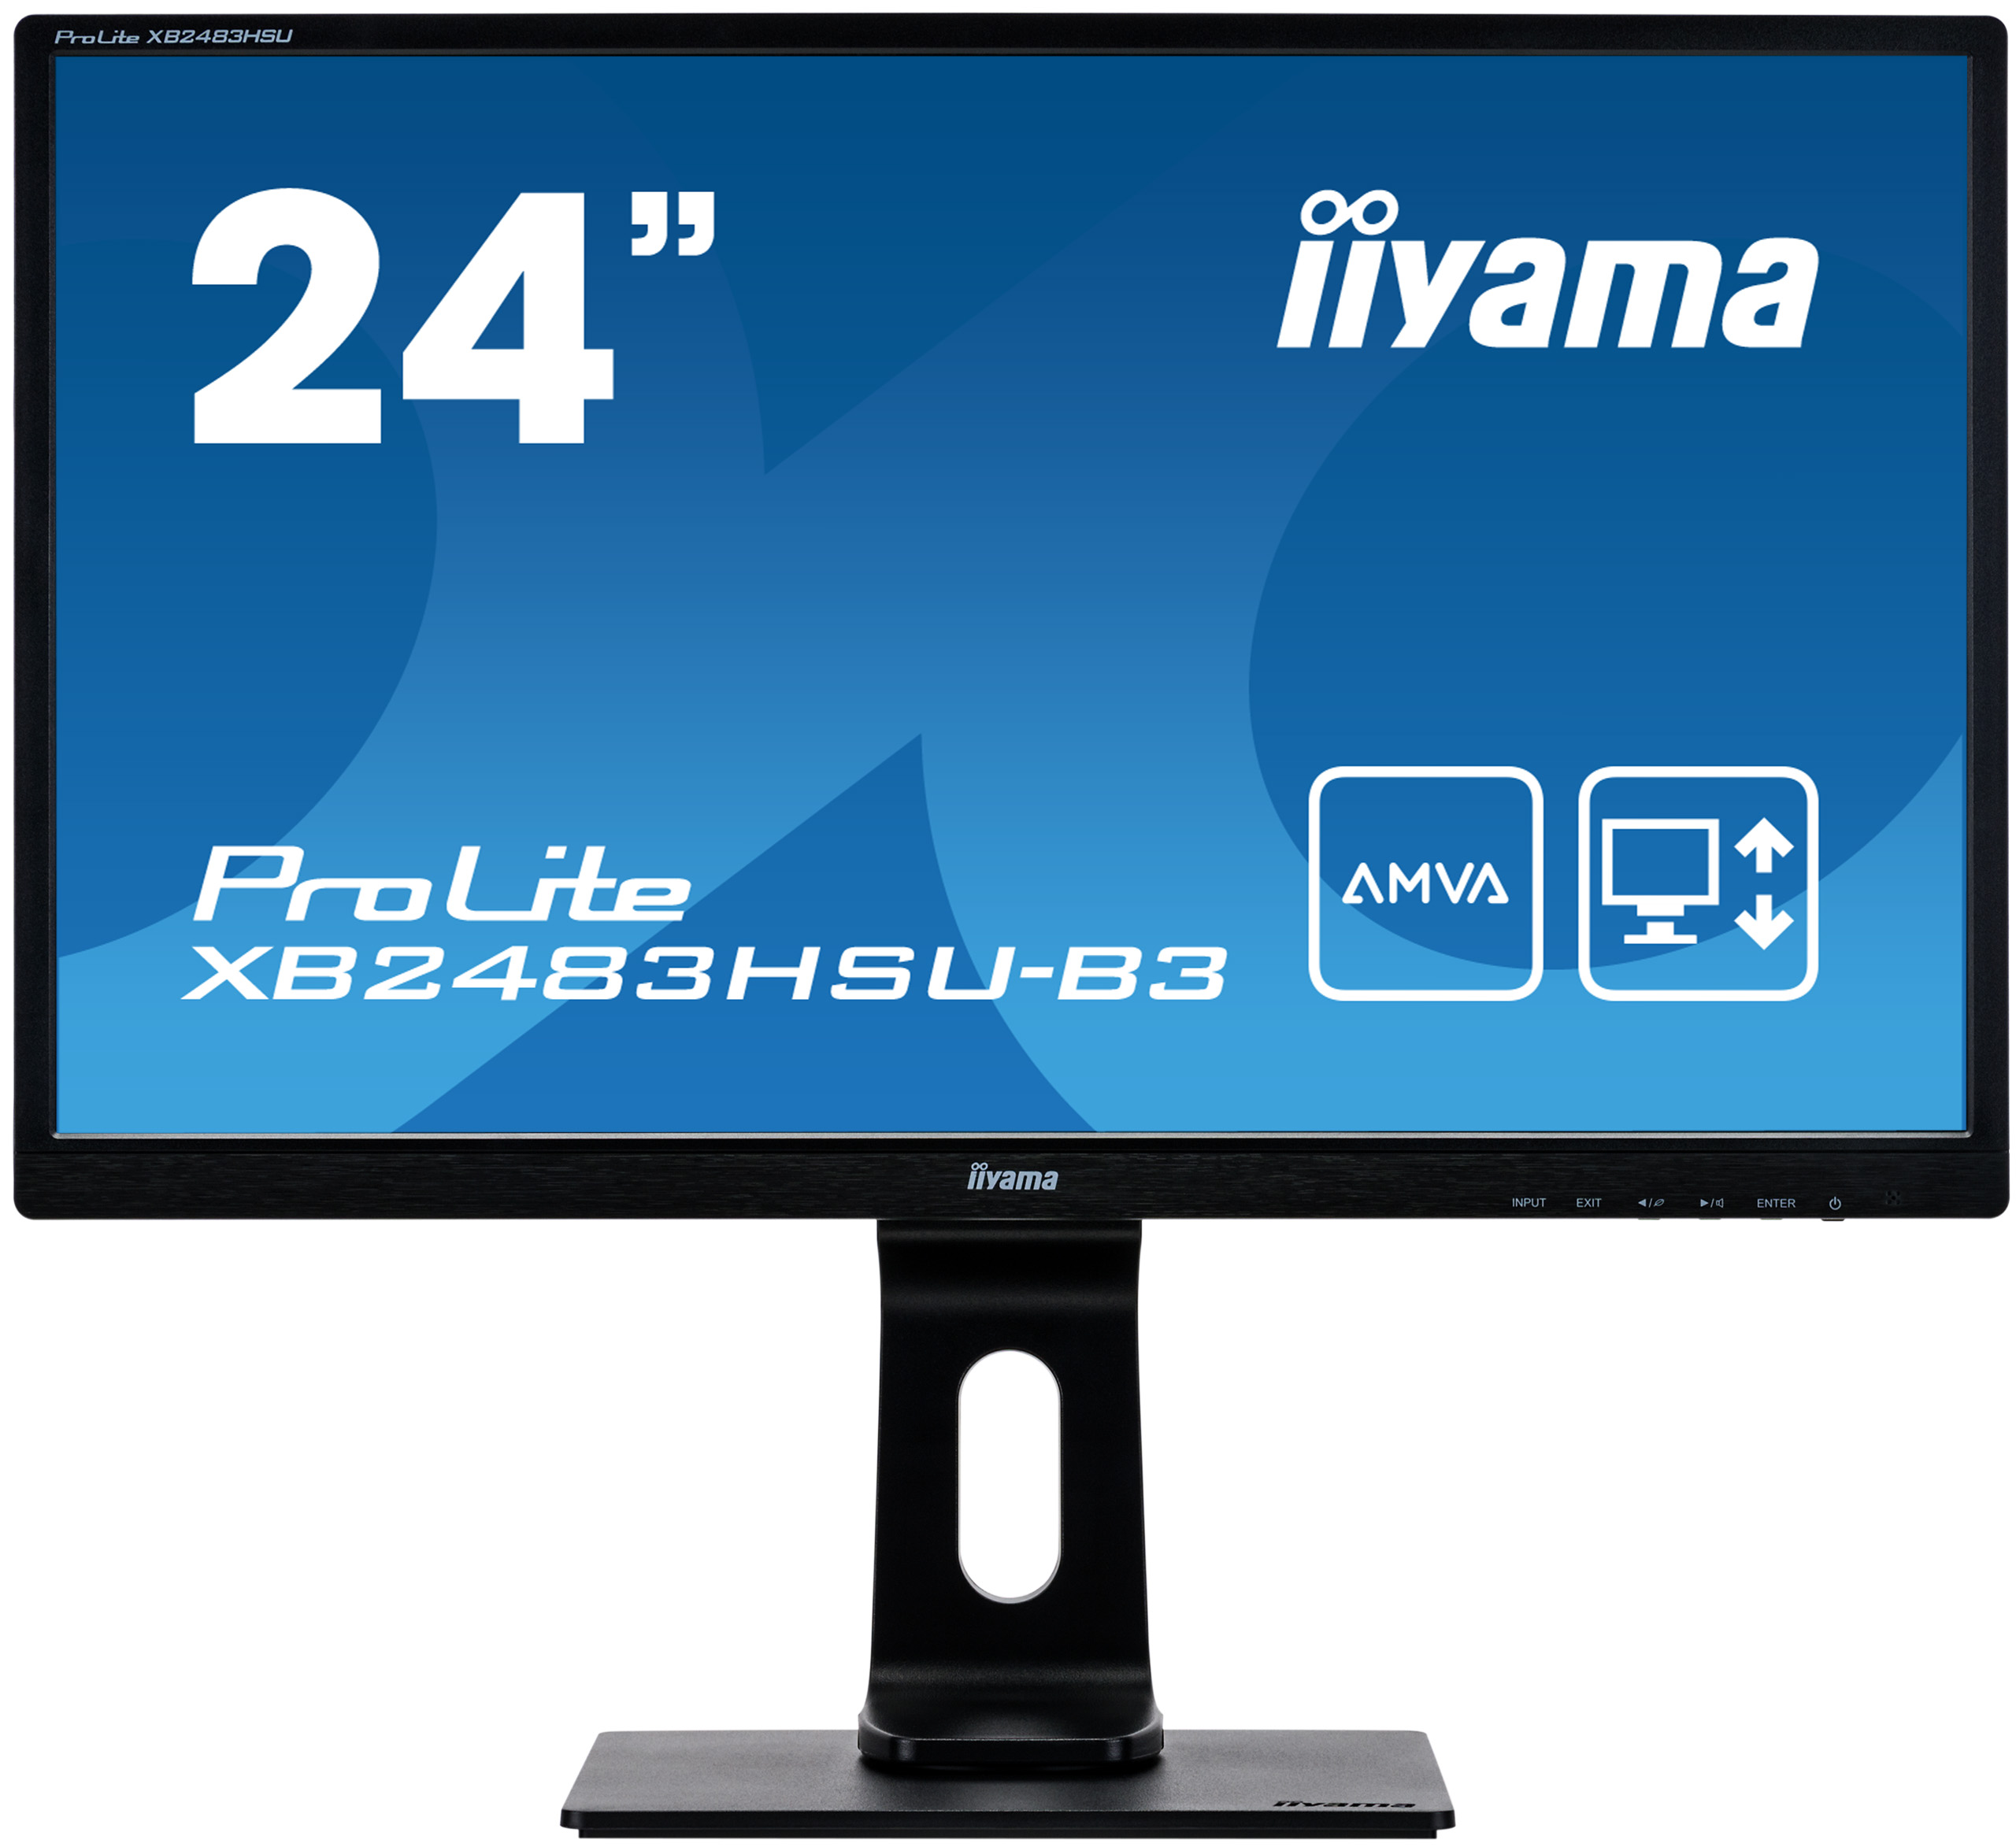 24'' iiyama XB2483HSU-B3: AMVA, FullHD@75Hz, 250cd/m2, 4ms, VGA, HDMI, DP, USB, height, pivot, černý - XB2483HSU-B3